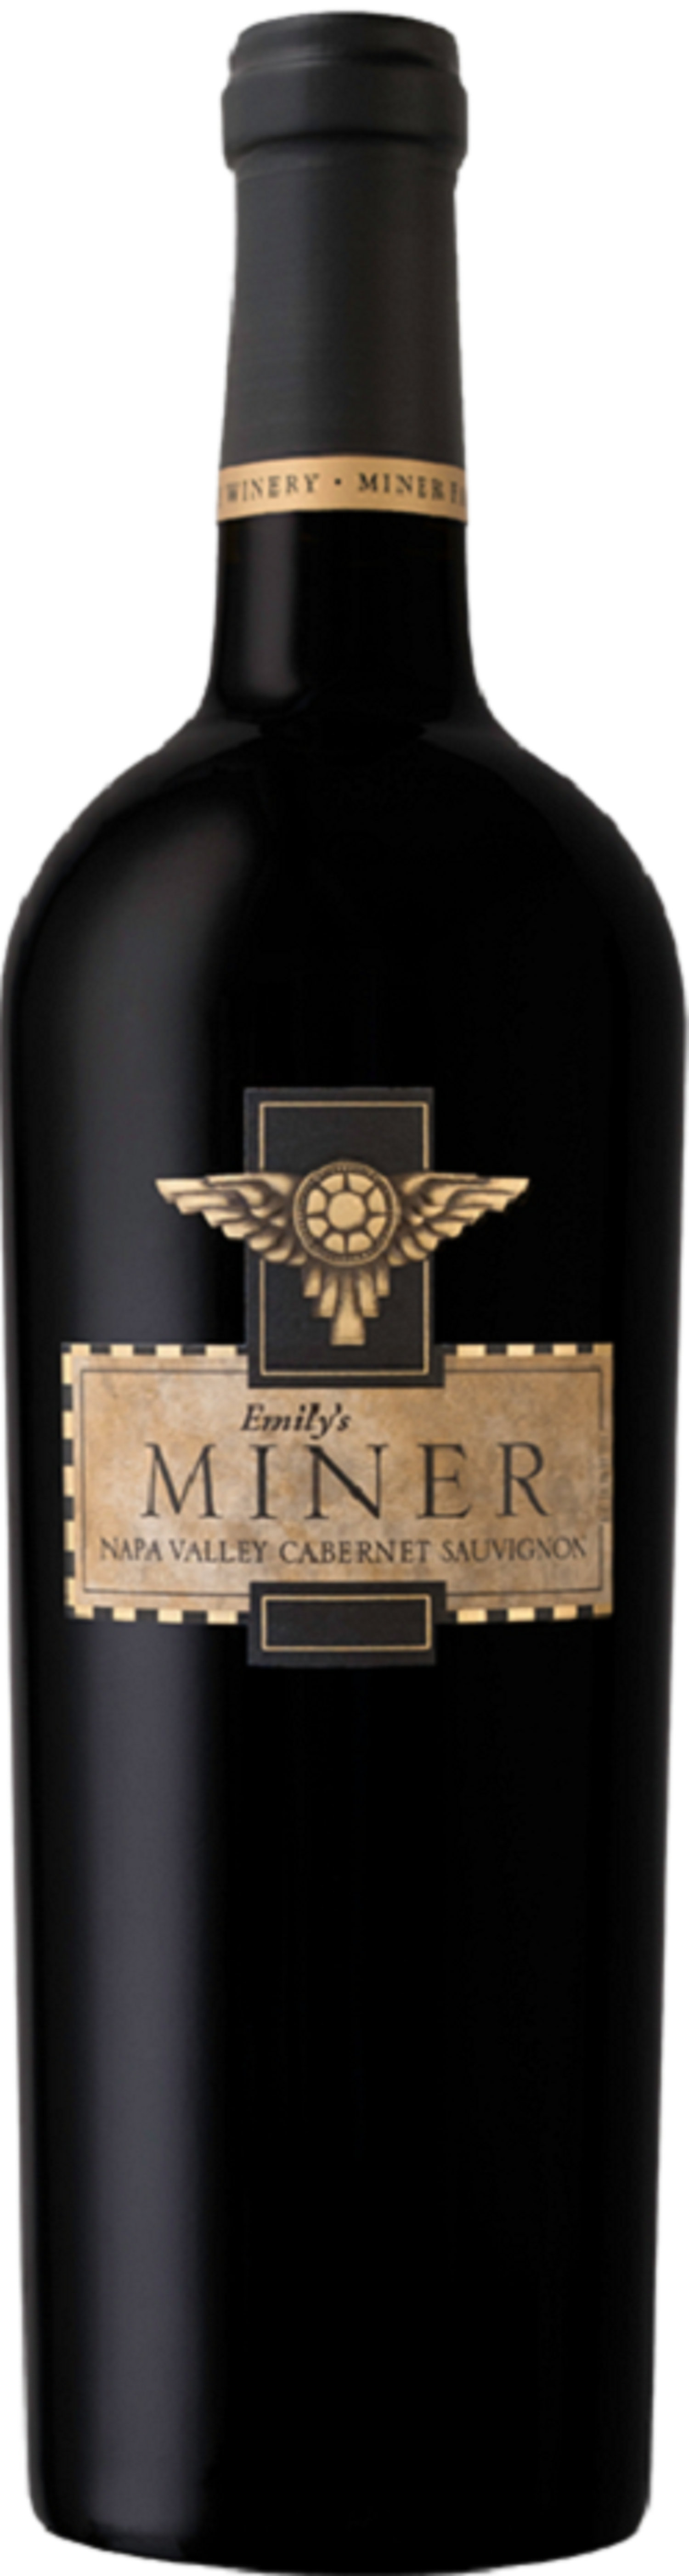 Miner - Emily's Napa Valley Cabernet Sauvignon